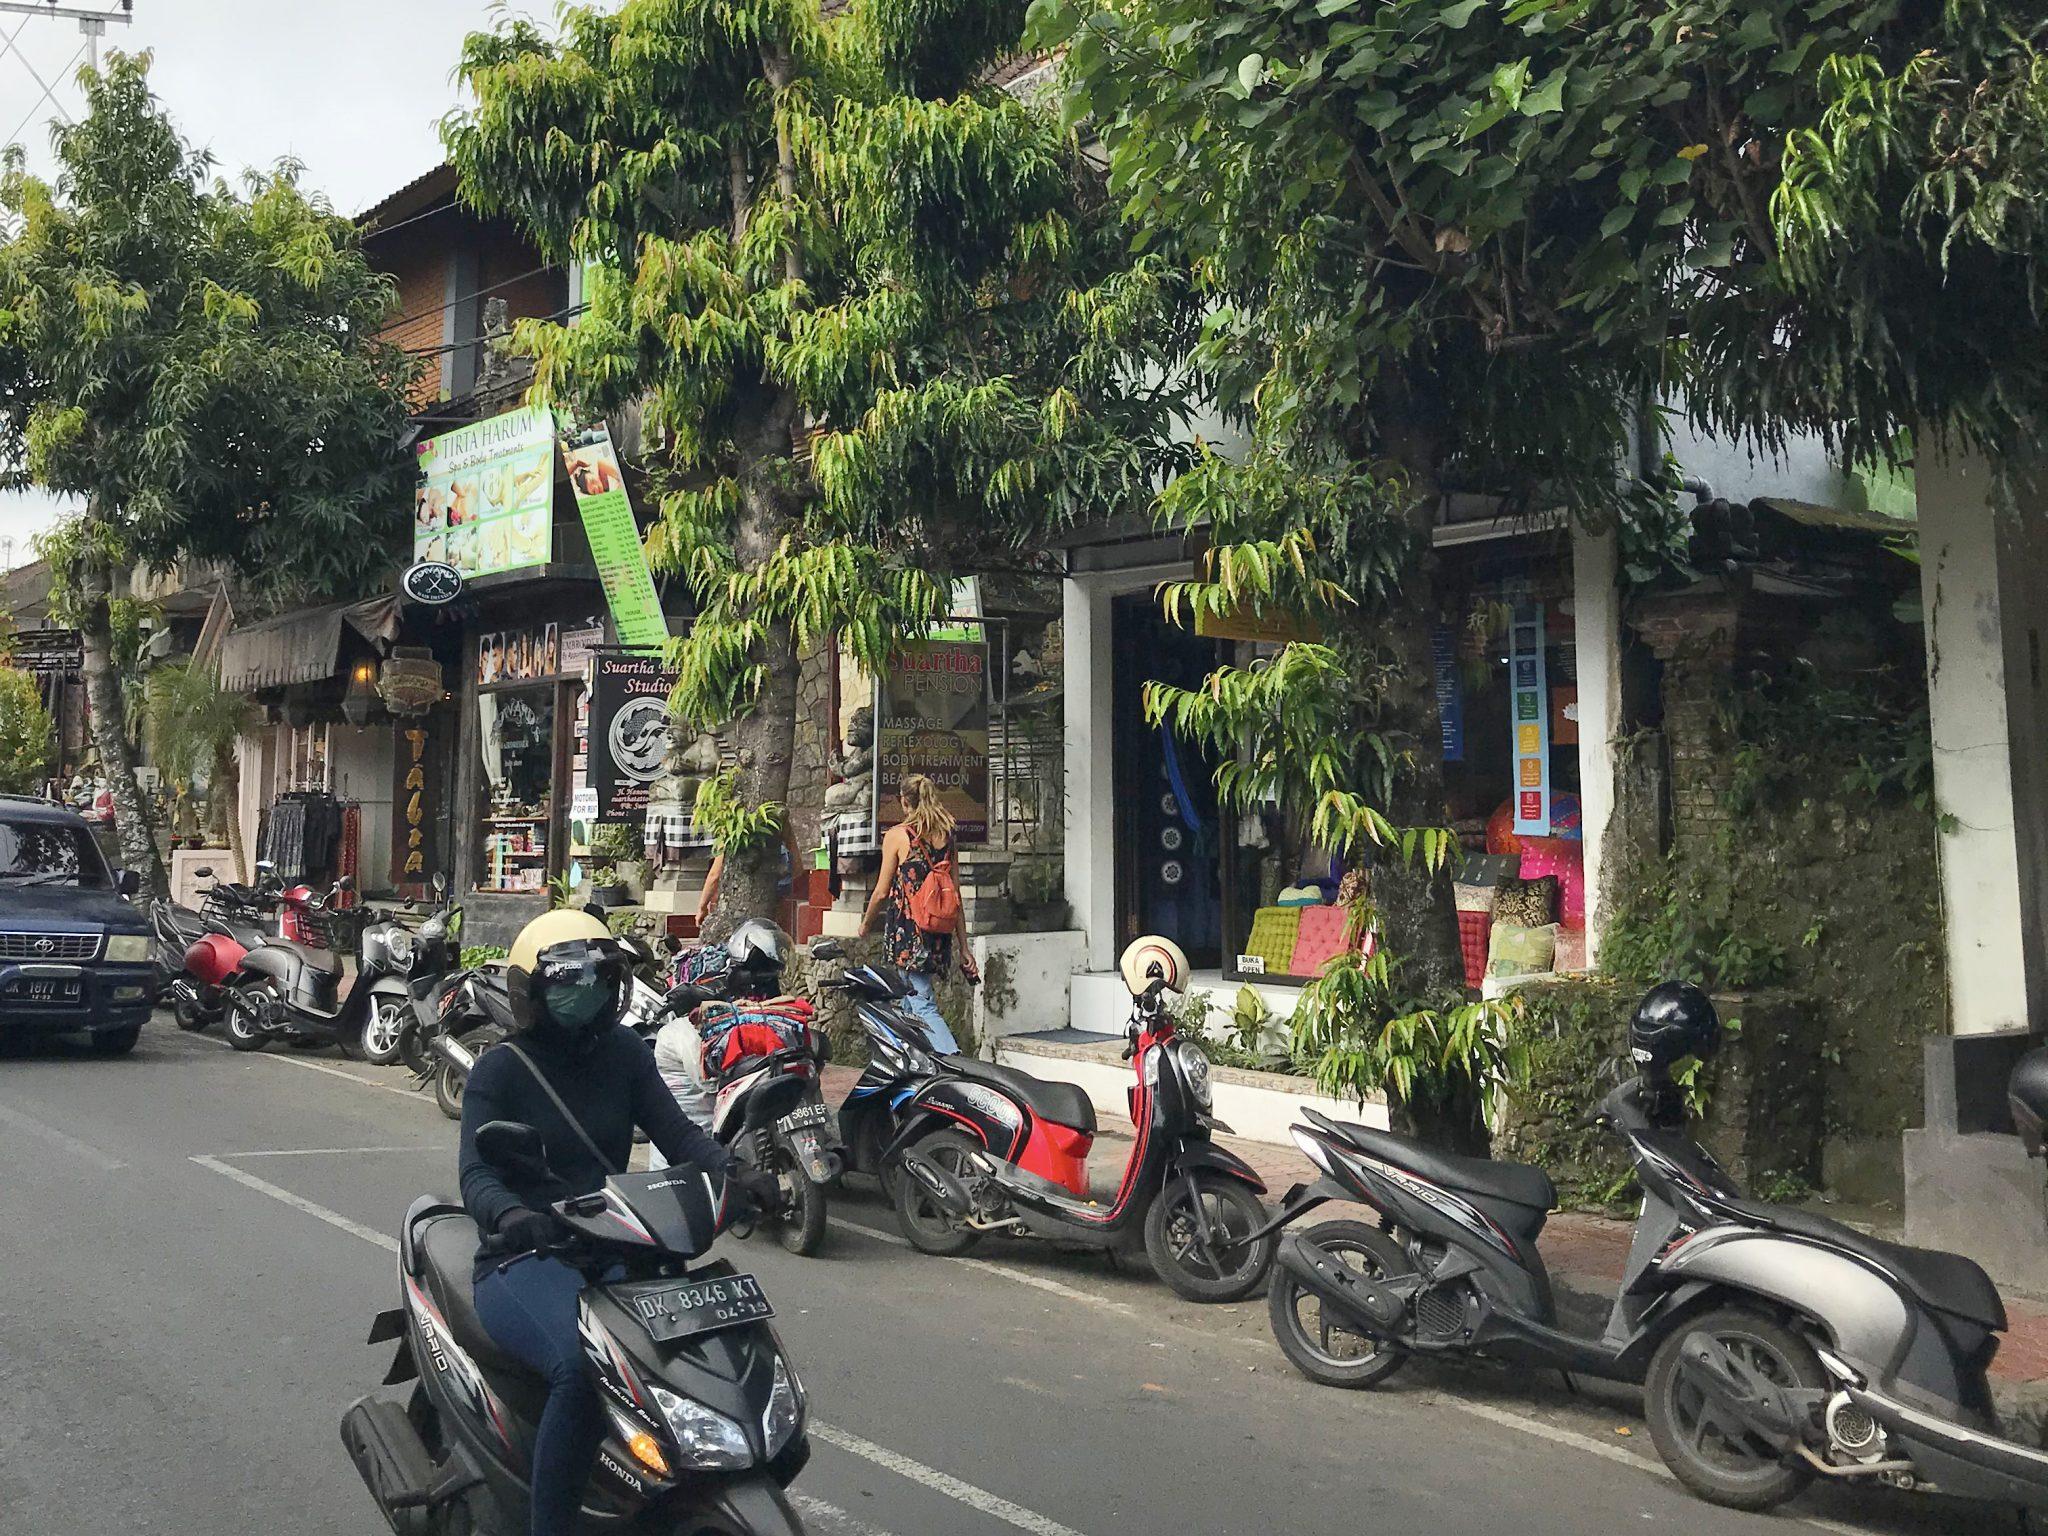 04 BALI FOTO02 - Bali i Nusa Lembongan